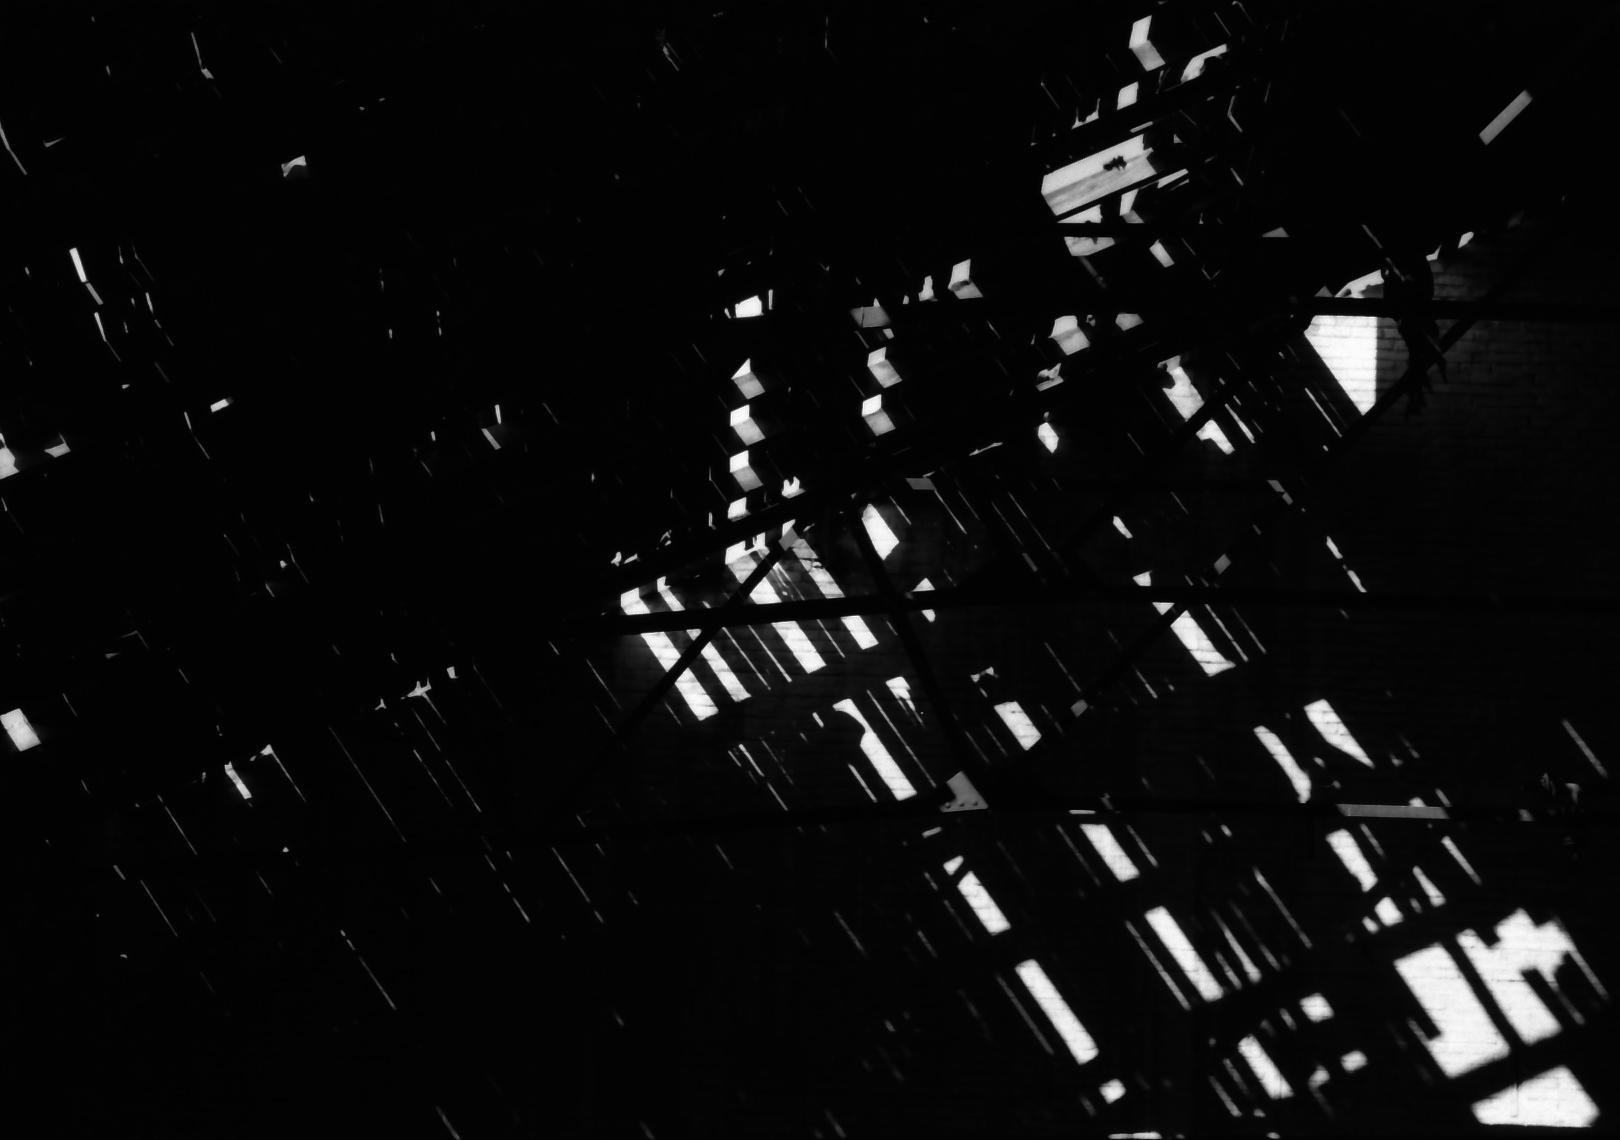 OHNE TITEL, SILVER GELATIN PRINT, 2008